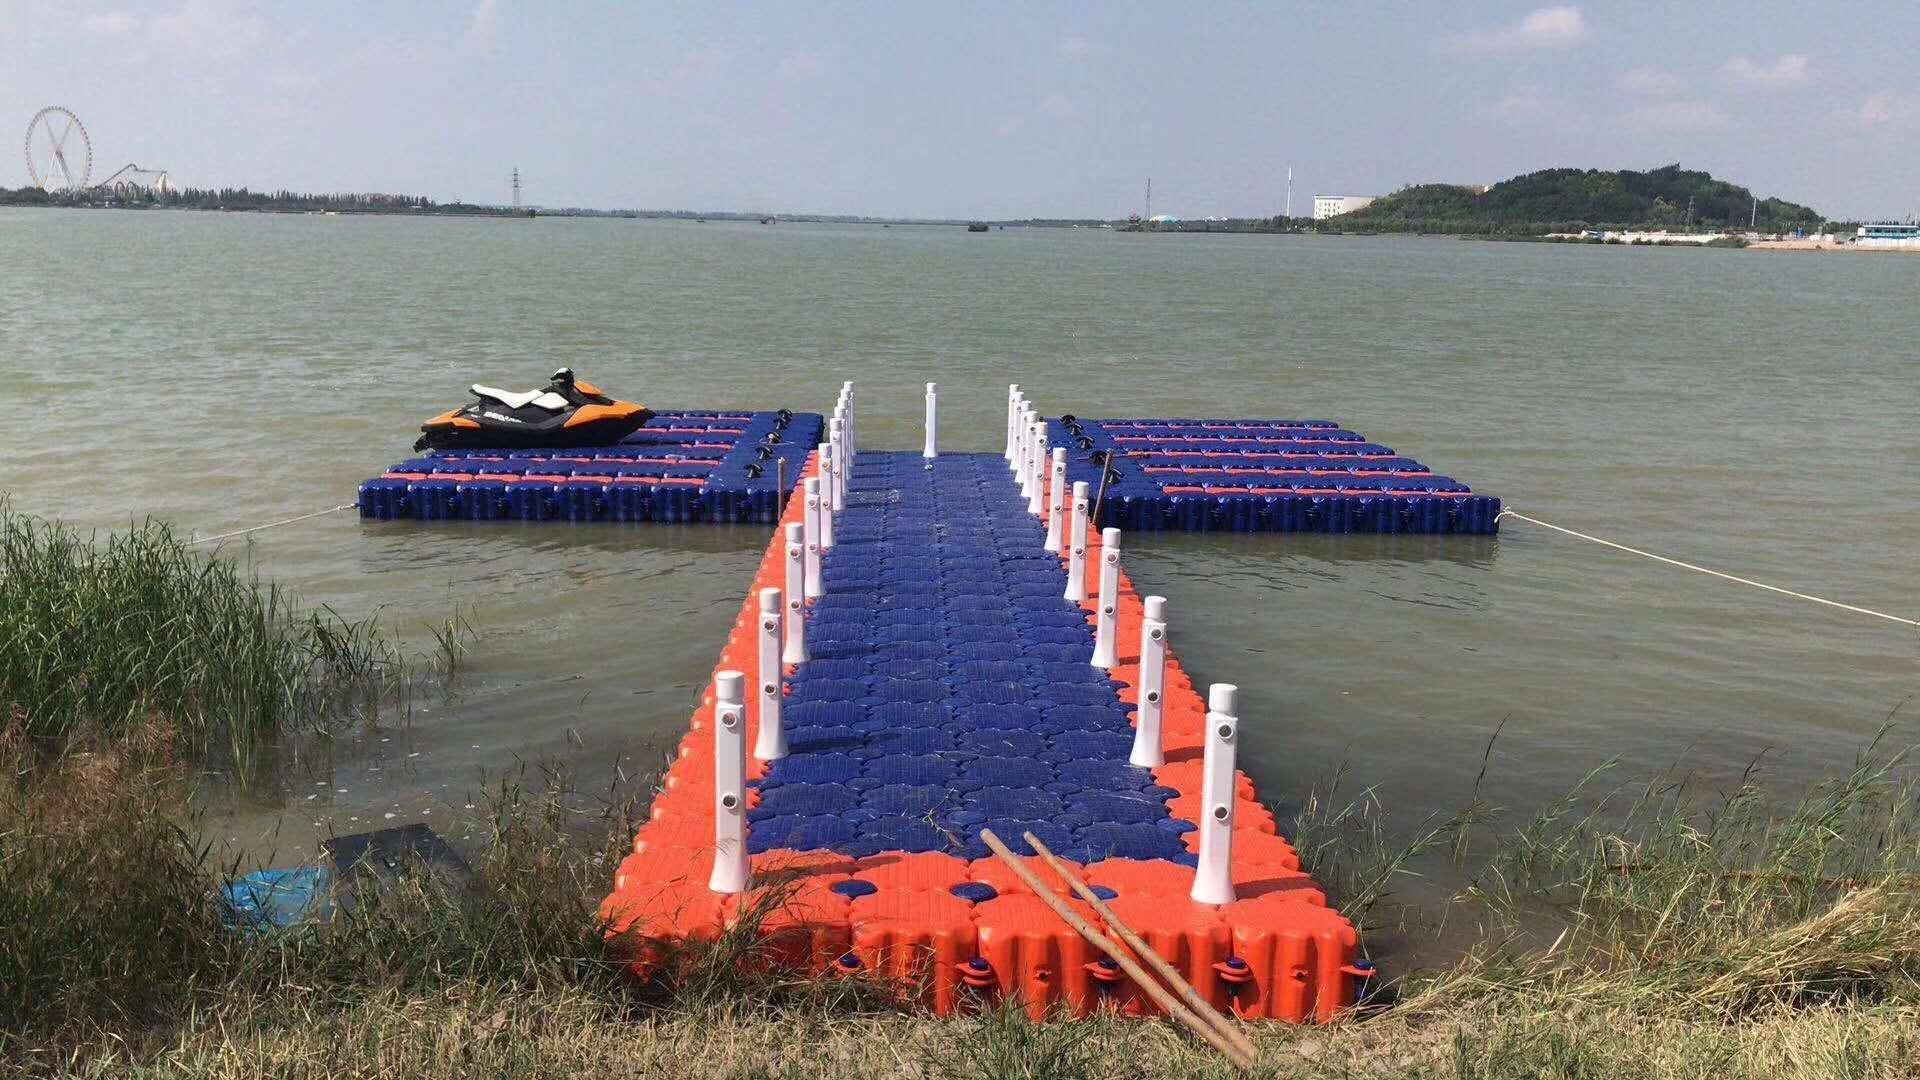 Floating platform floating platform yacht wharf fishing platform plastic platform